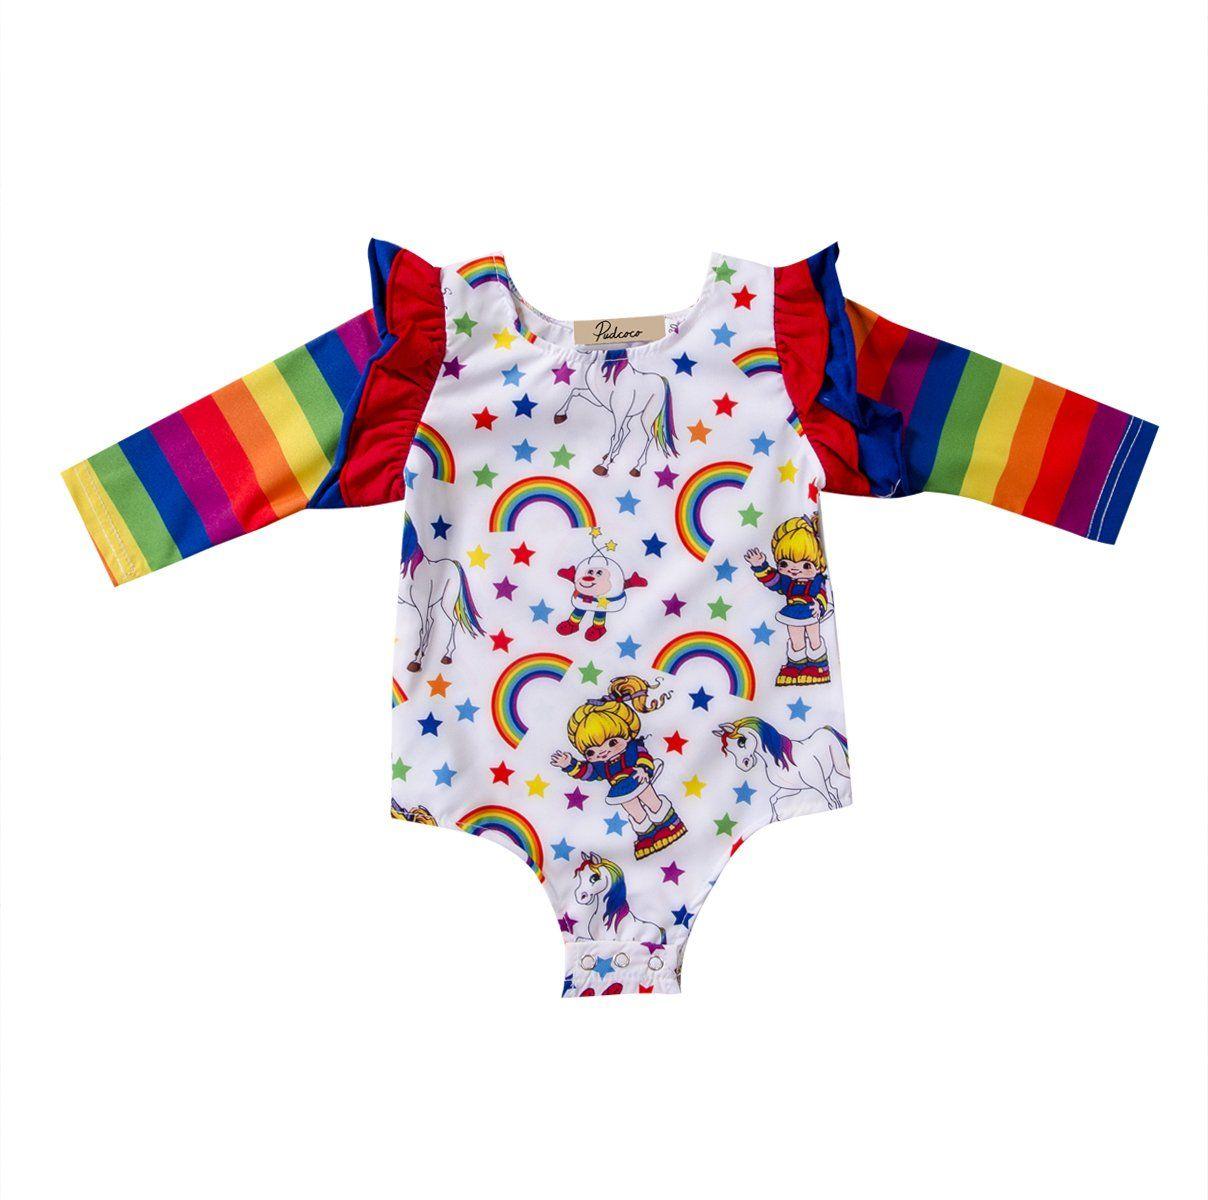 rainbow photoshoot stripe special value Bright rainbow newborn sweater knit vest bright baby clothes ready to ship Rainbow Baby knit